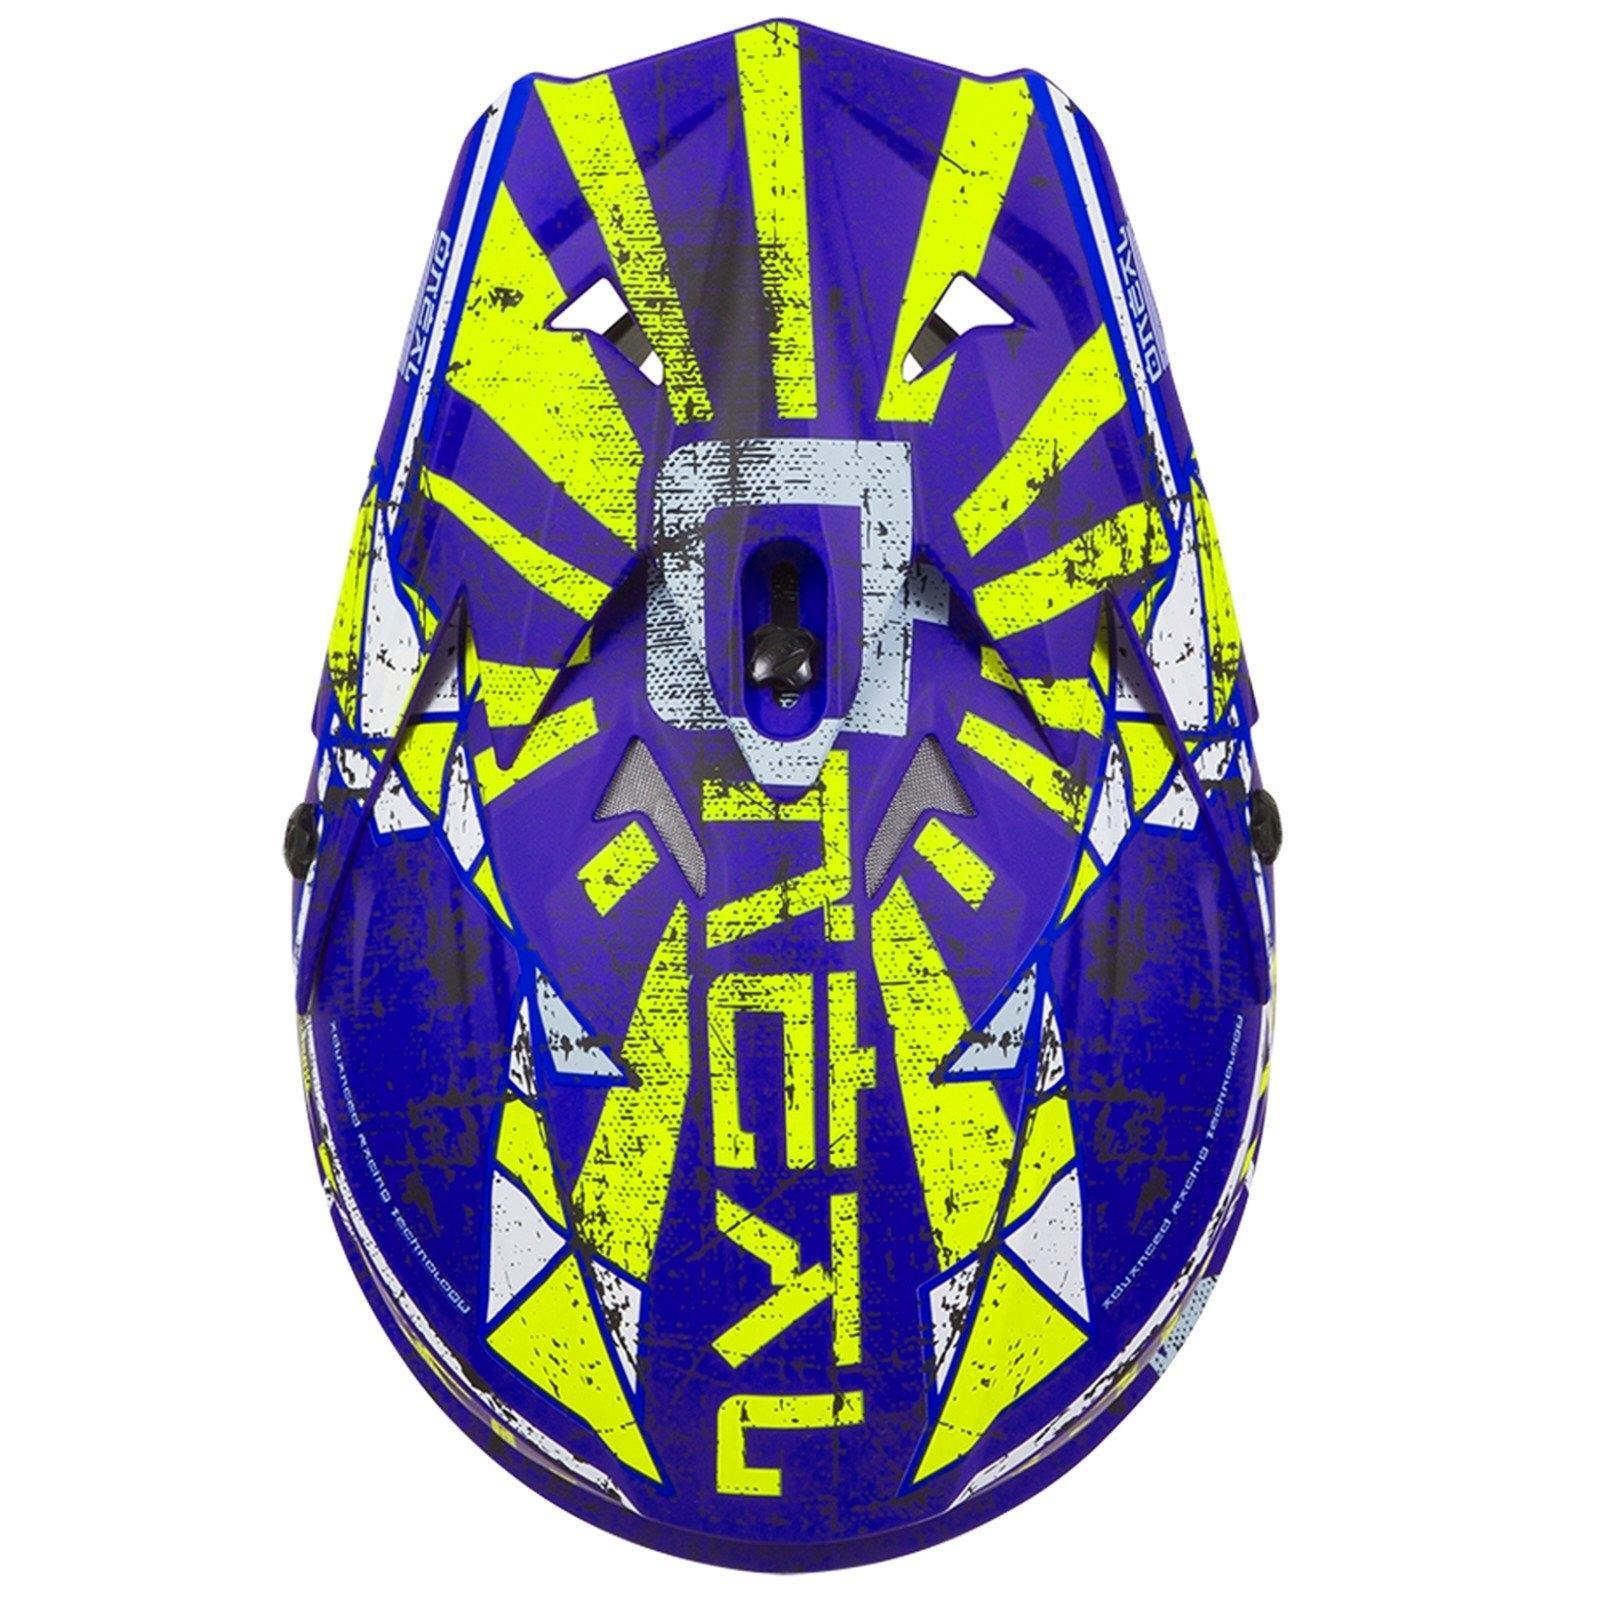 ONeal-Motocross-casco-MX-ENDURO-MOTO-BICI-FUORISTRADA-CROSS-Series-Adventure miniatura 24